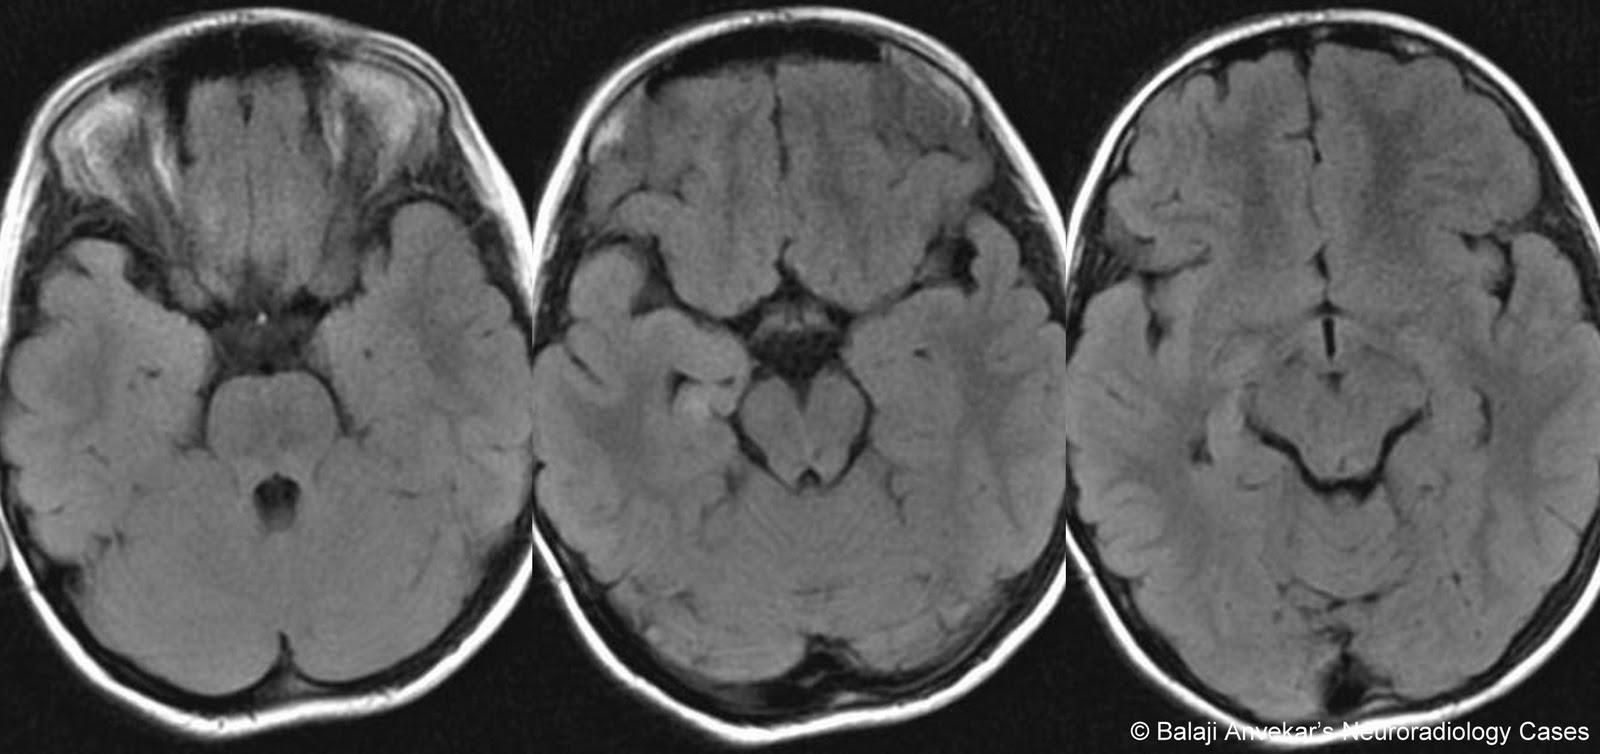 Dr Balaji Anvekars Neuroradiology Cases 011111 011211